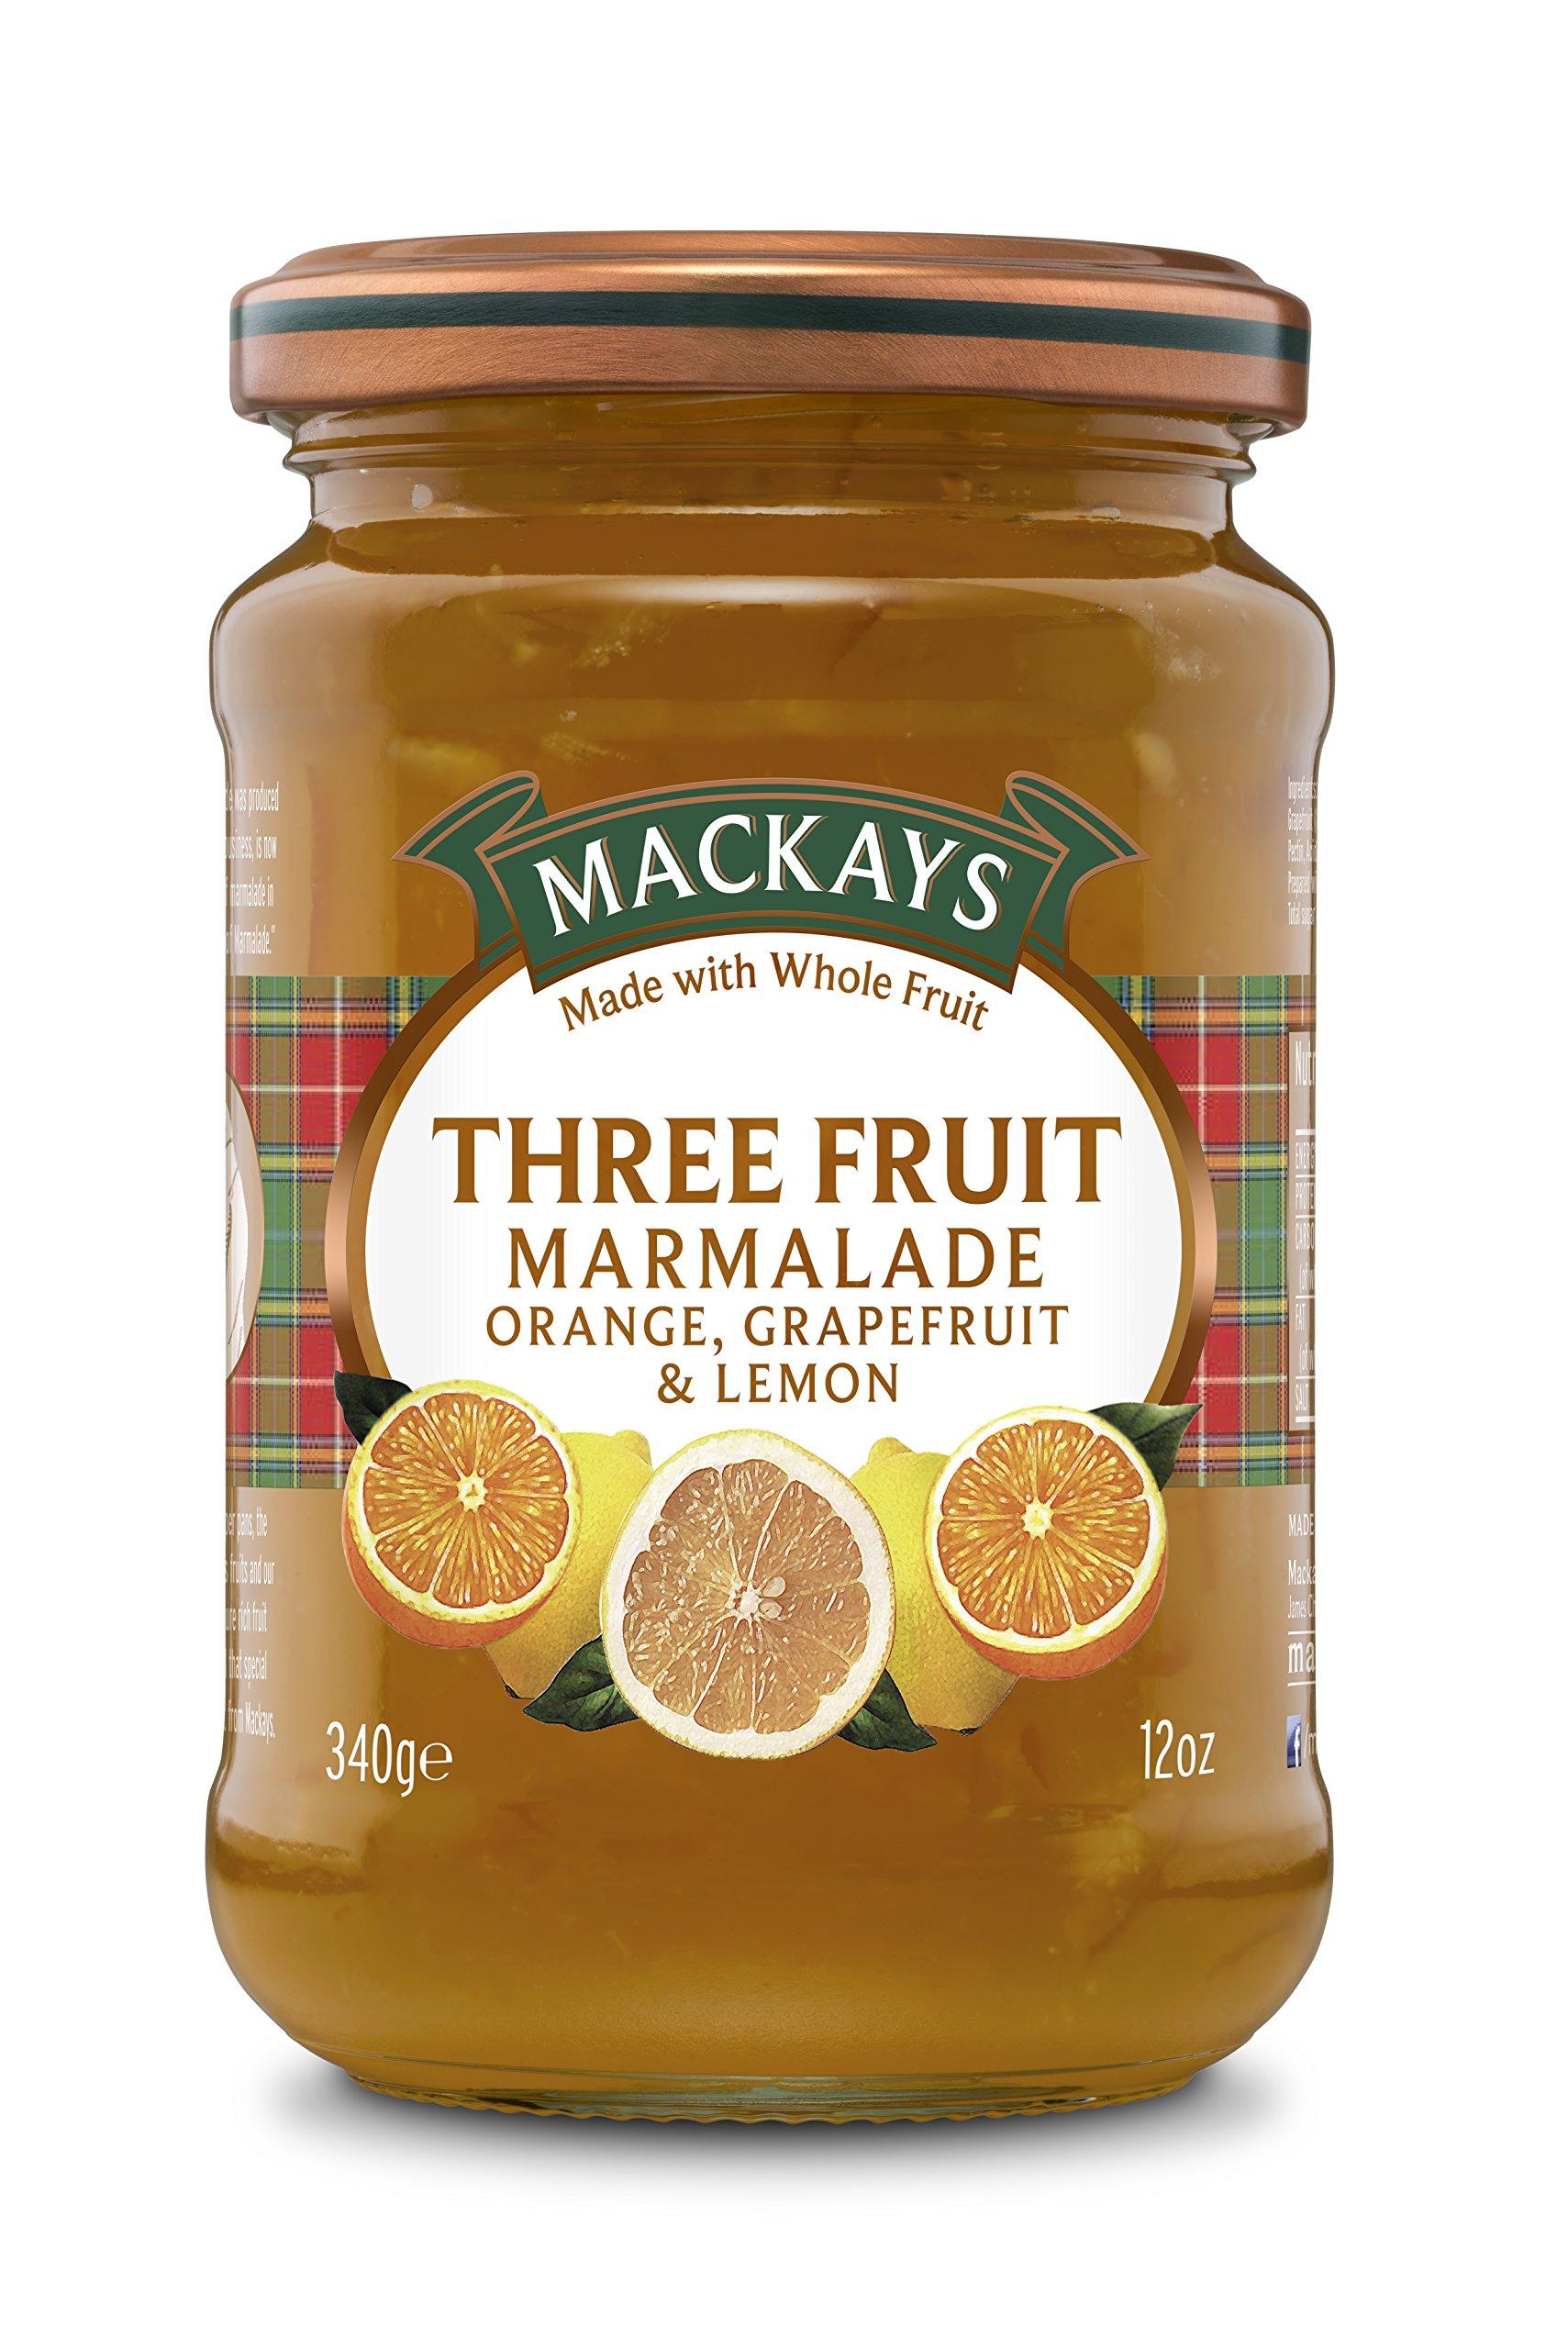 Mackays Three Fruit Marmalade, 12 Ounce